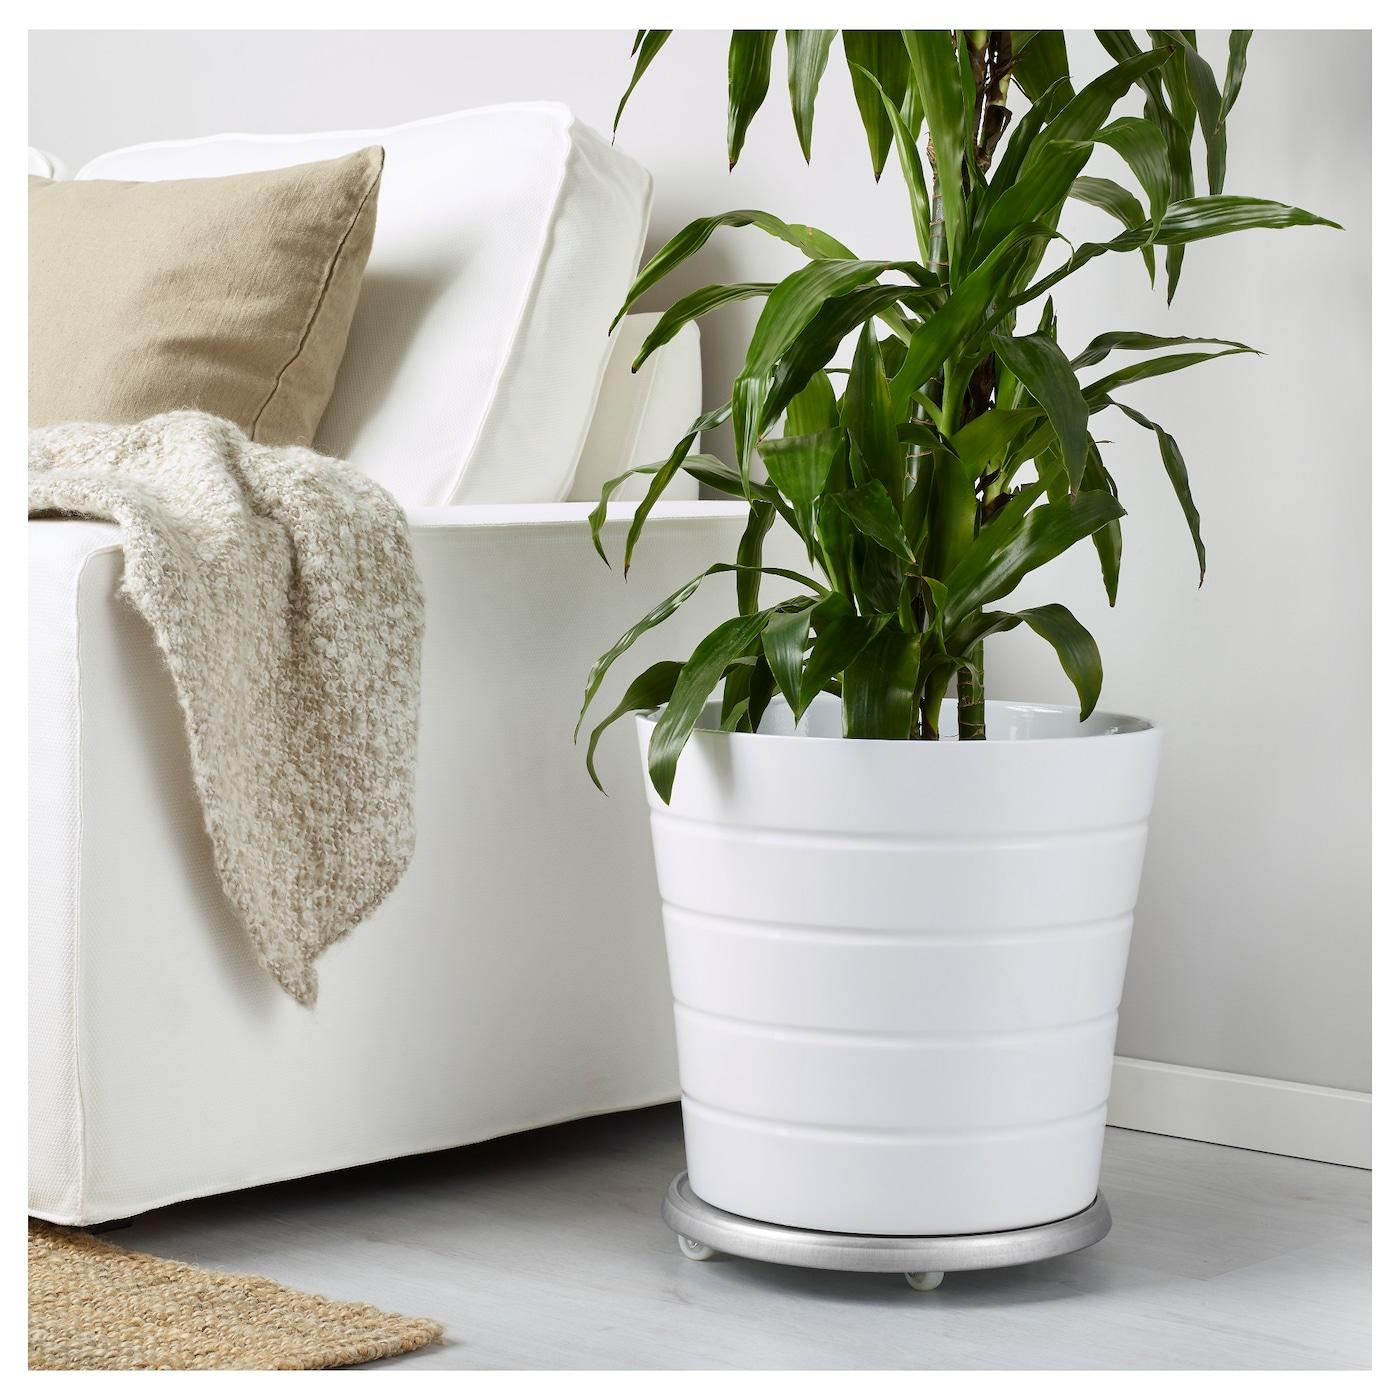 Socker plant mover in outdoor galvanised 31 cm ikea for Ikea maceteros exterior